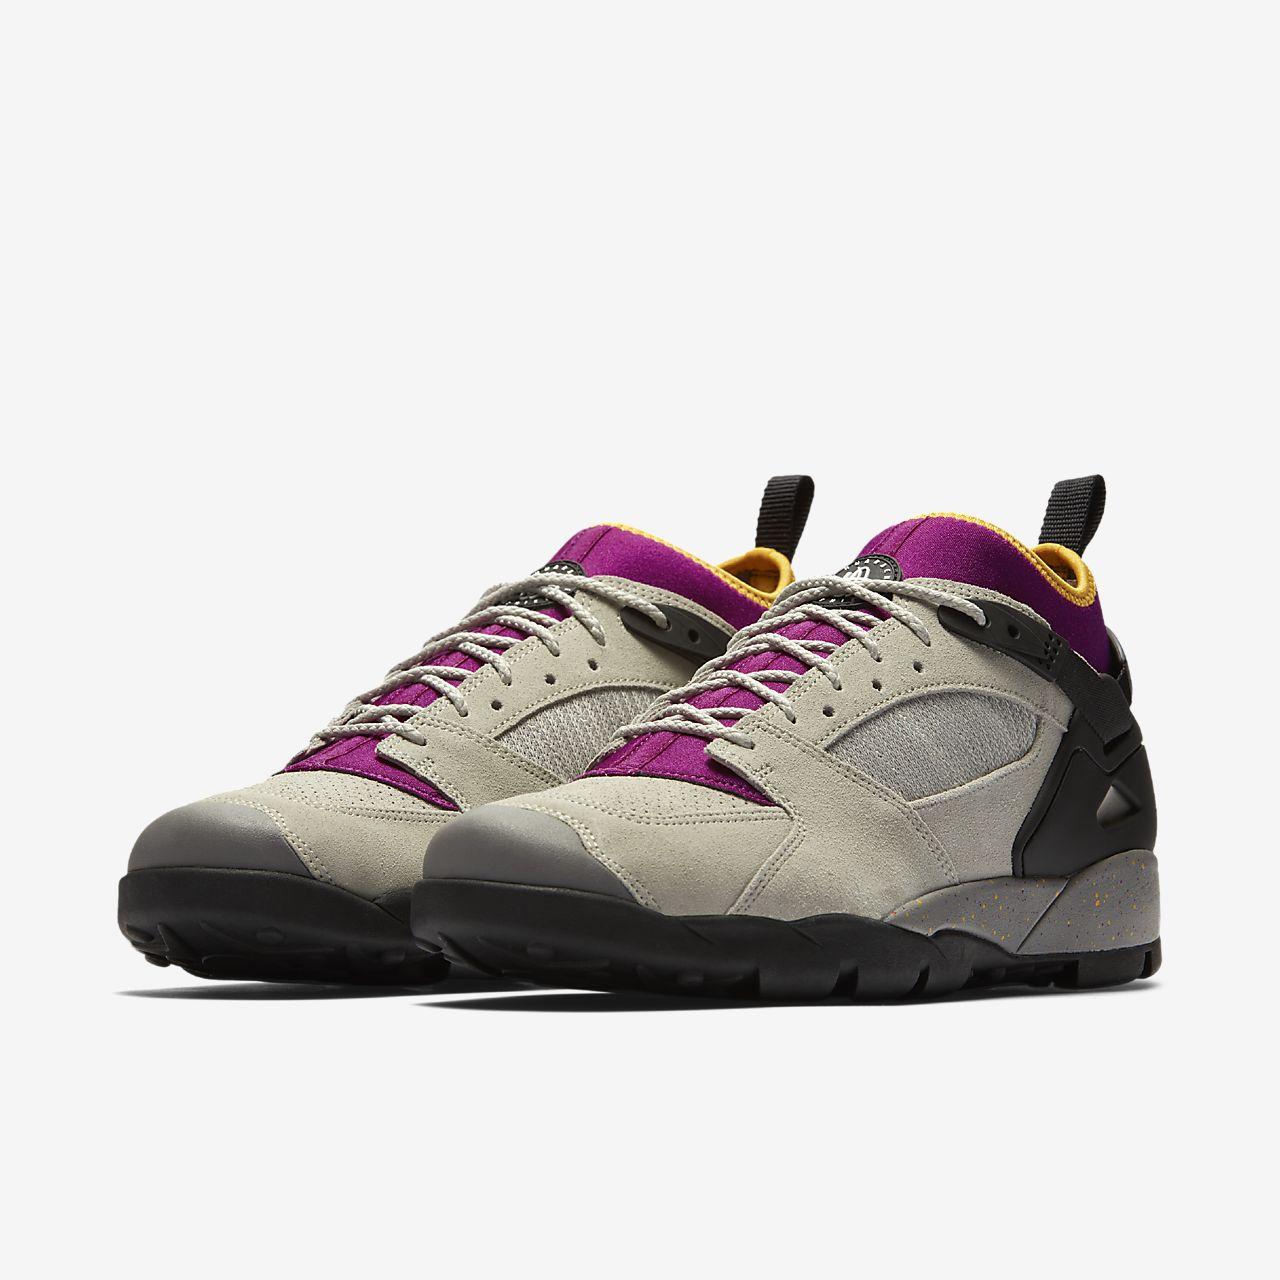 Conception innovante b7836 b2f2f Nike ACG Air Revaderchi Men's Shoe